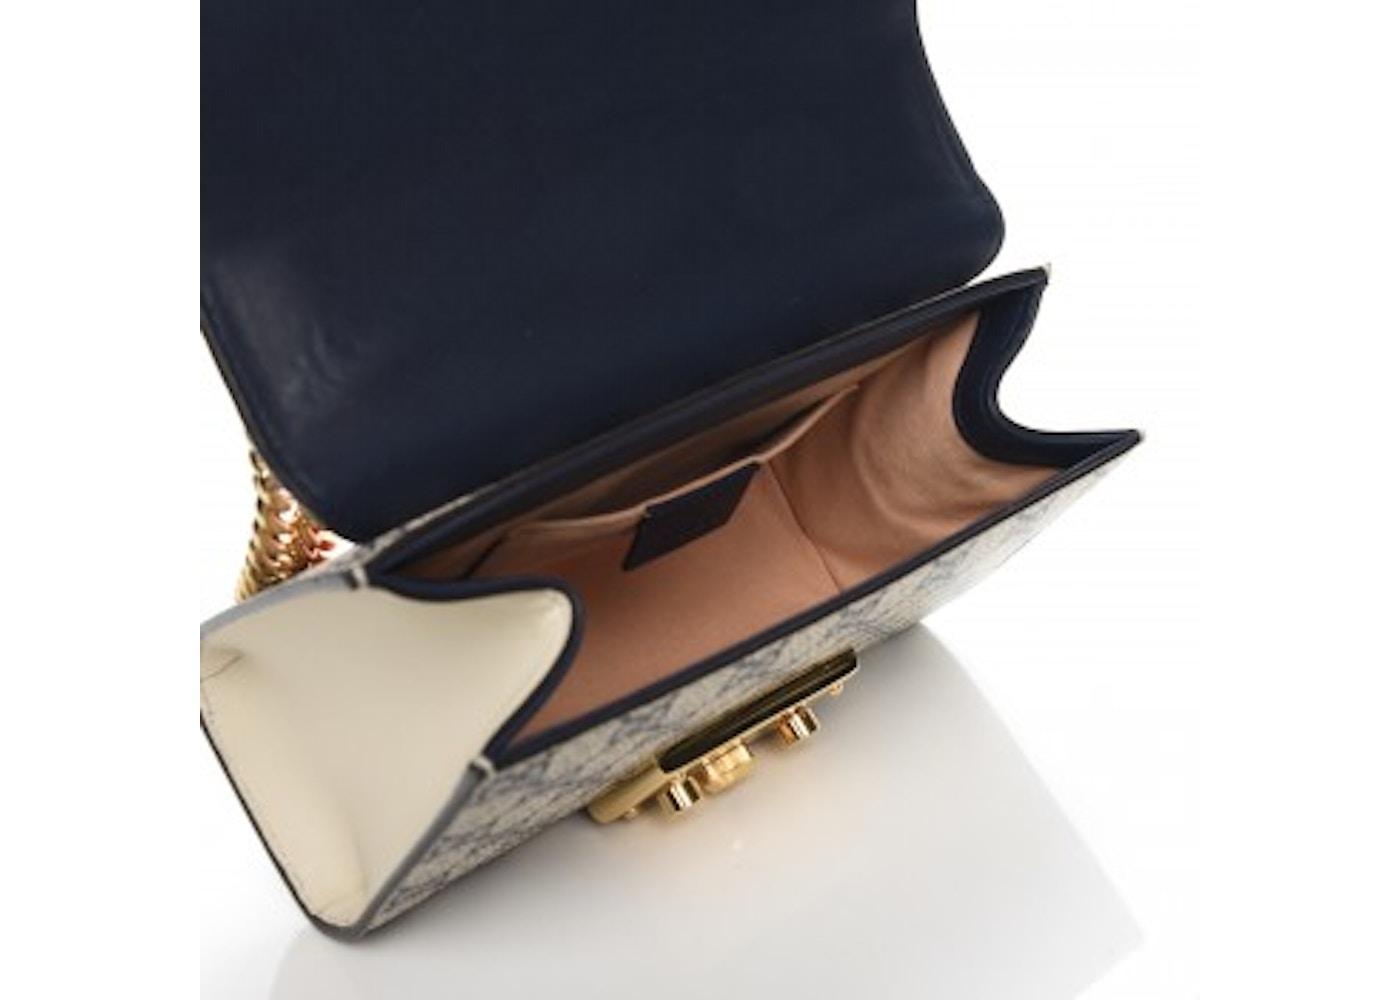 8245350002c4 Gucci Padlock Shoulder Bag GG Supreme Monogram Push Lock Closure Open Small  Navy Beige Red